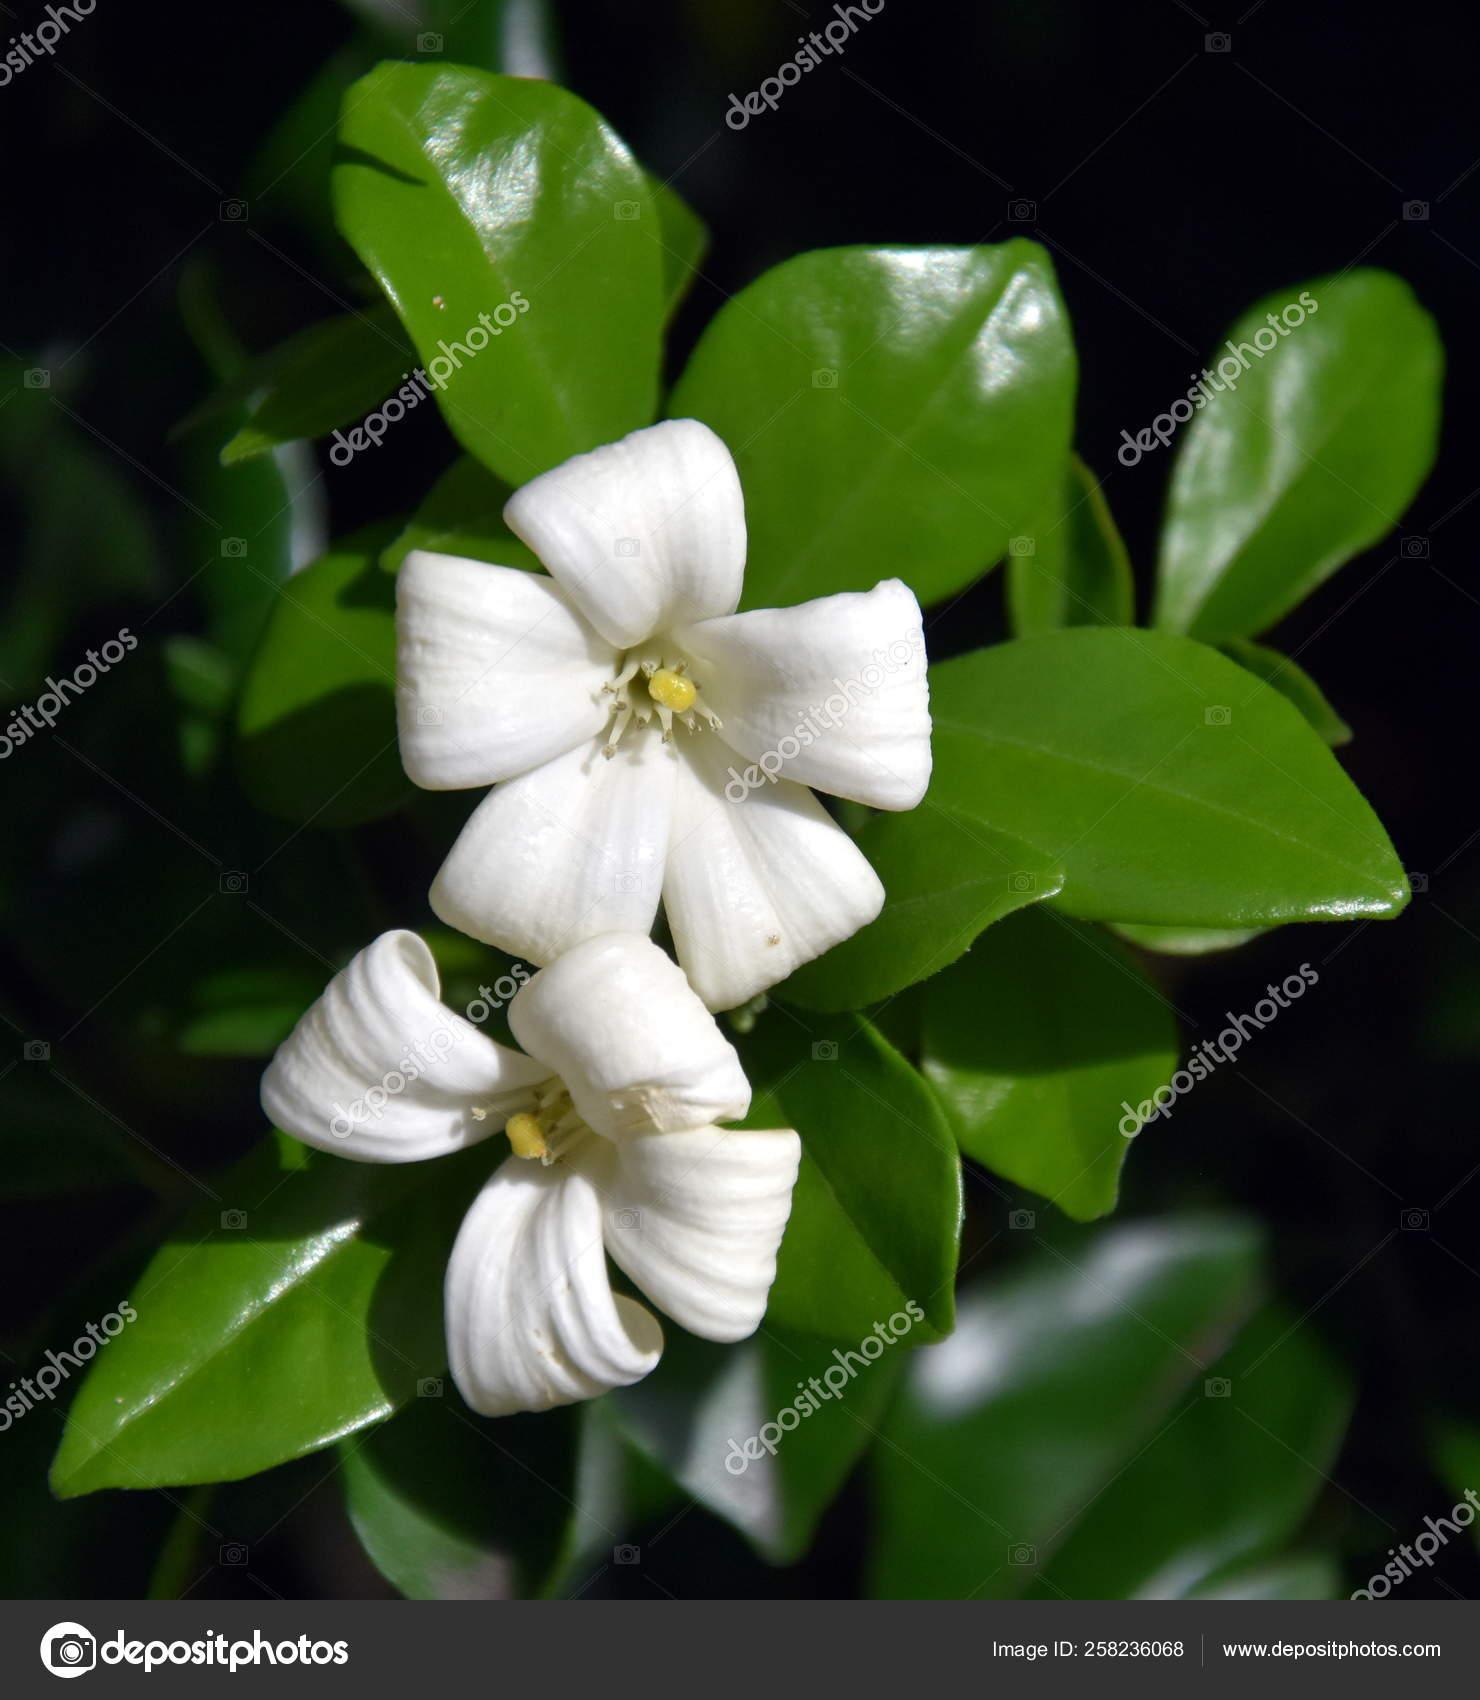 White Flowers Orange Jessamine Murraya Paniculata Jasminul Portocal Murraya Exotica Stock Photo By C Katacarix 258236068